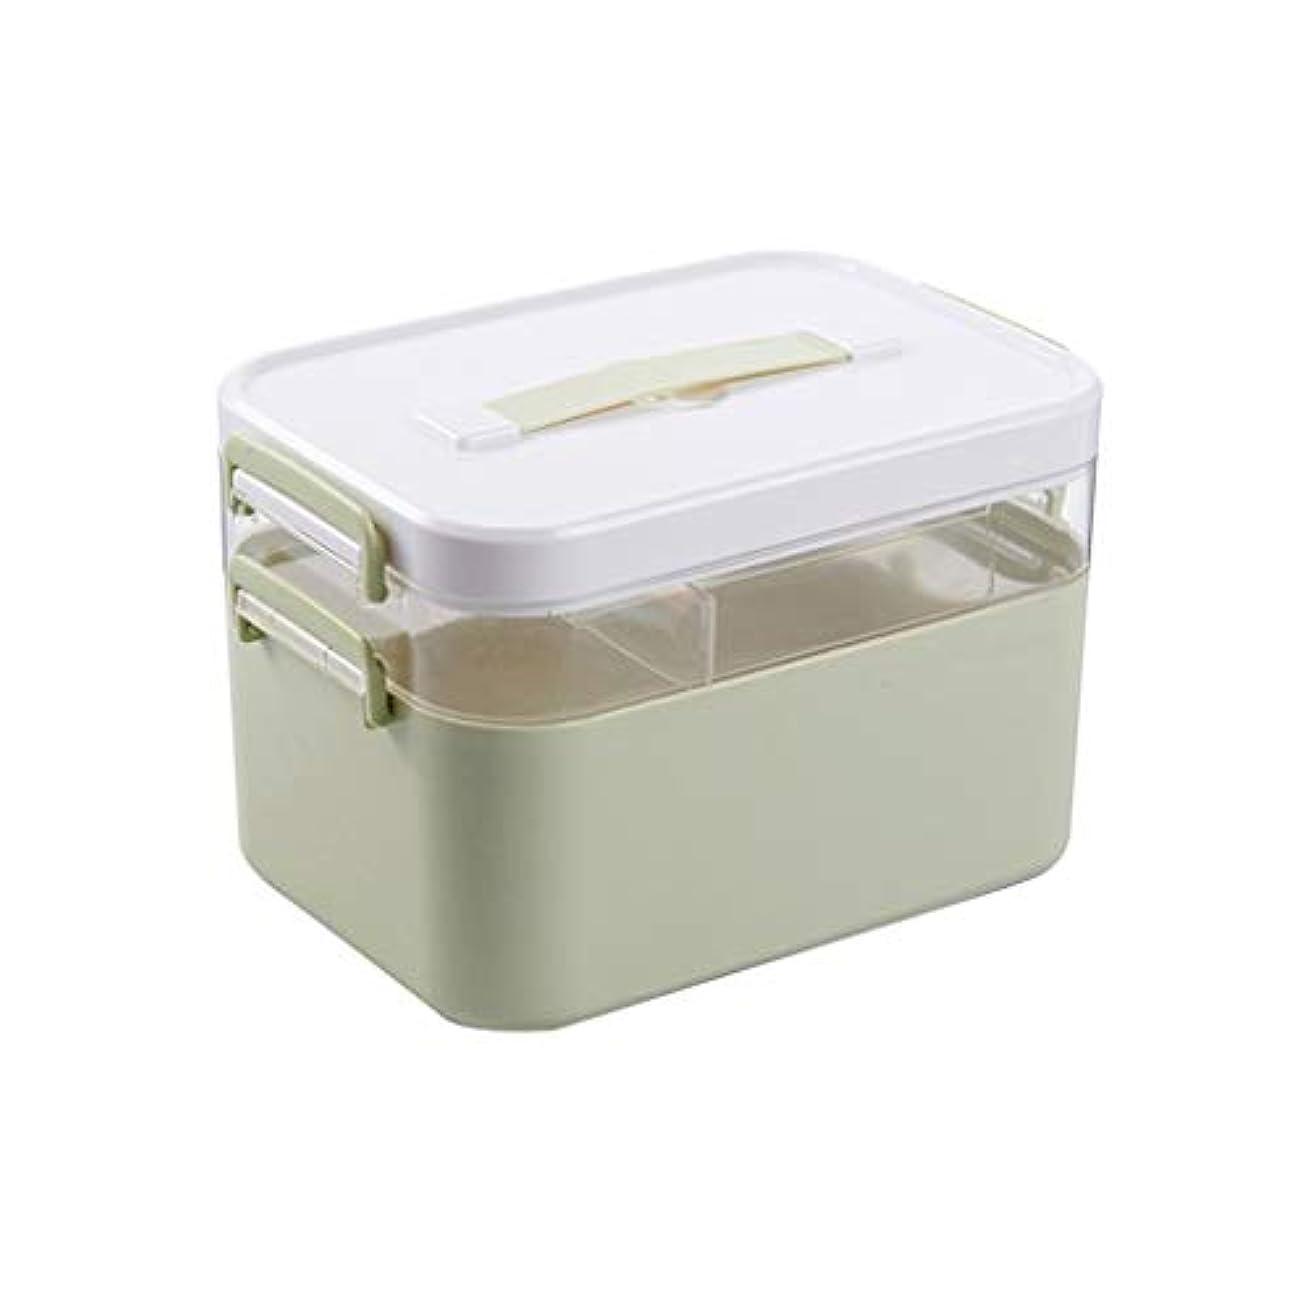 XKJPShop 救急箱 薬箱収納ボックス、職場応急処置キット、ファミリープラスチック応急処置収納ボックス 応急処置ケース、家庭、職場、学校 (Color : Double layer, Size : S)